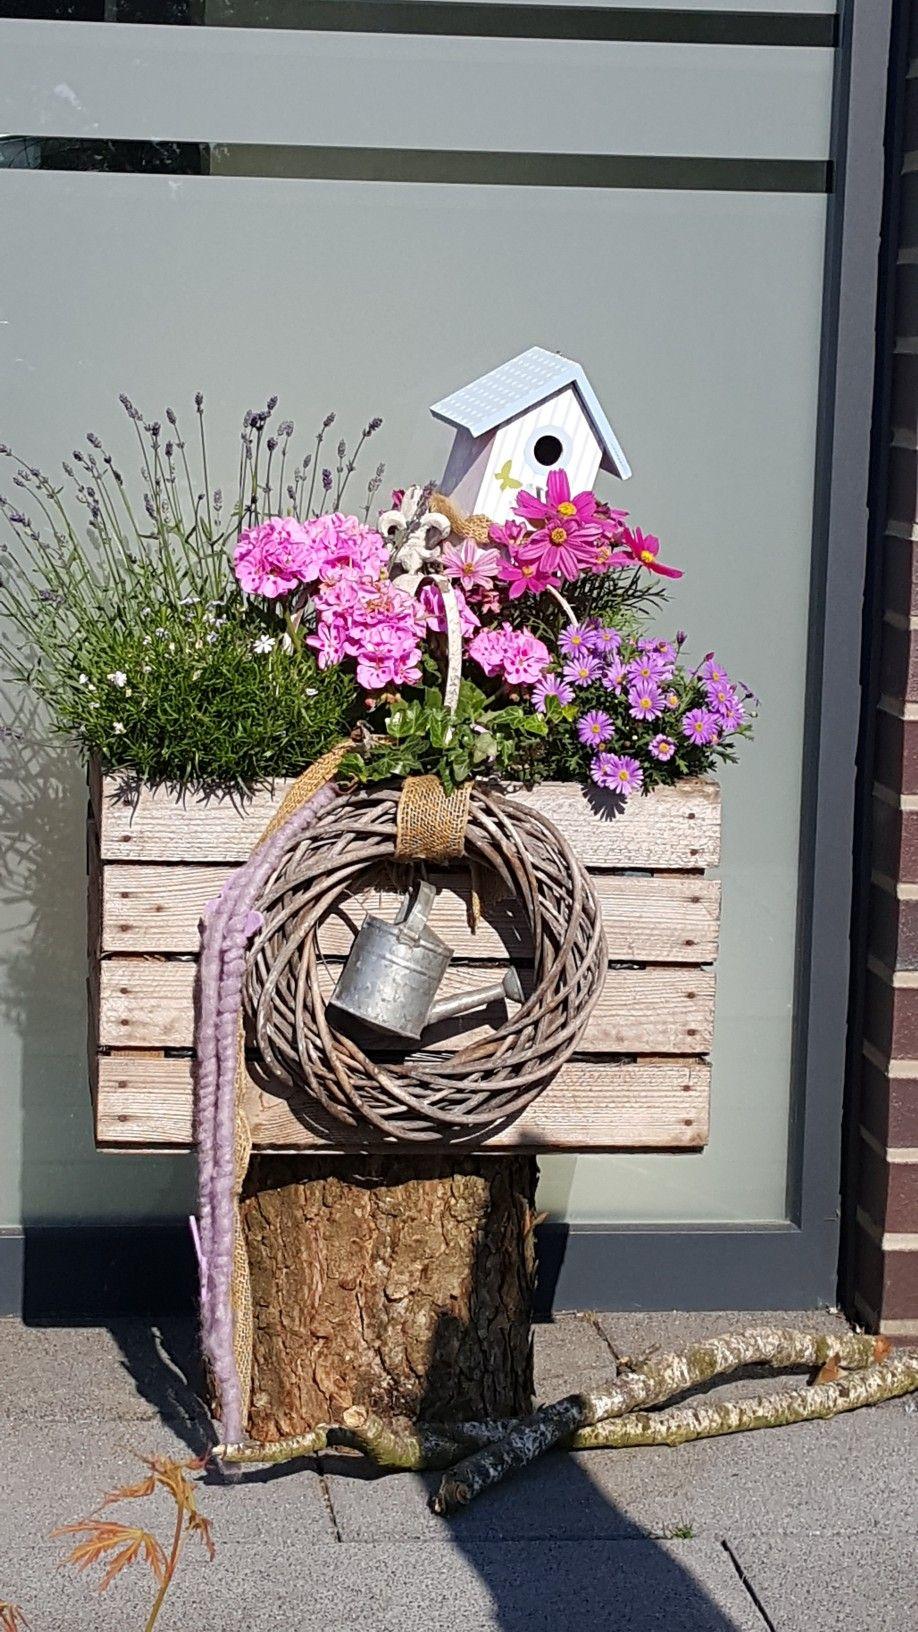 Deko Hauseingang sommer Einzigartig sommerdeko Blumendeko Haustür Eingang Deko